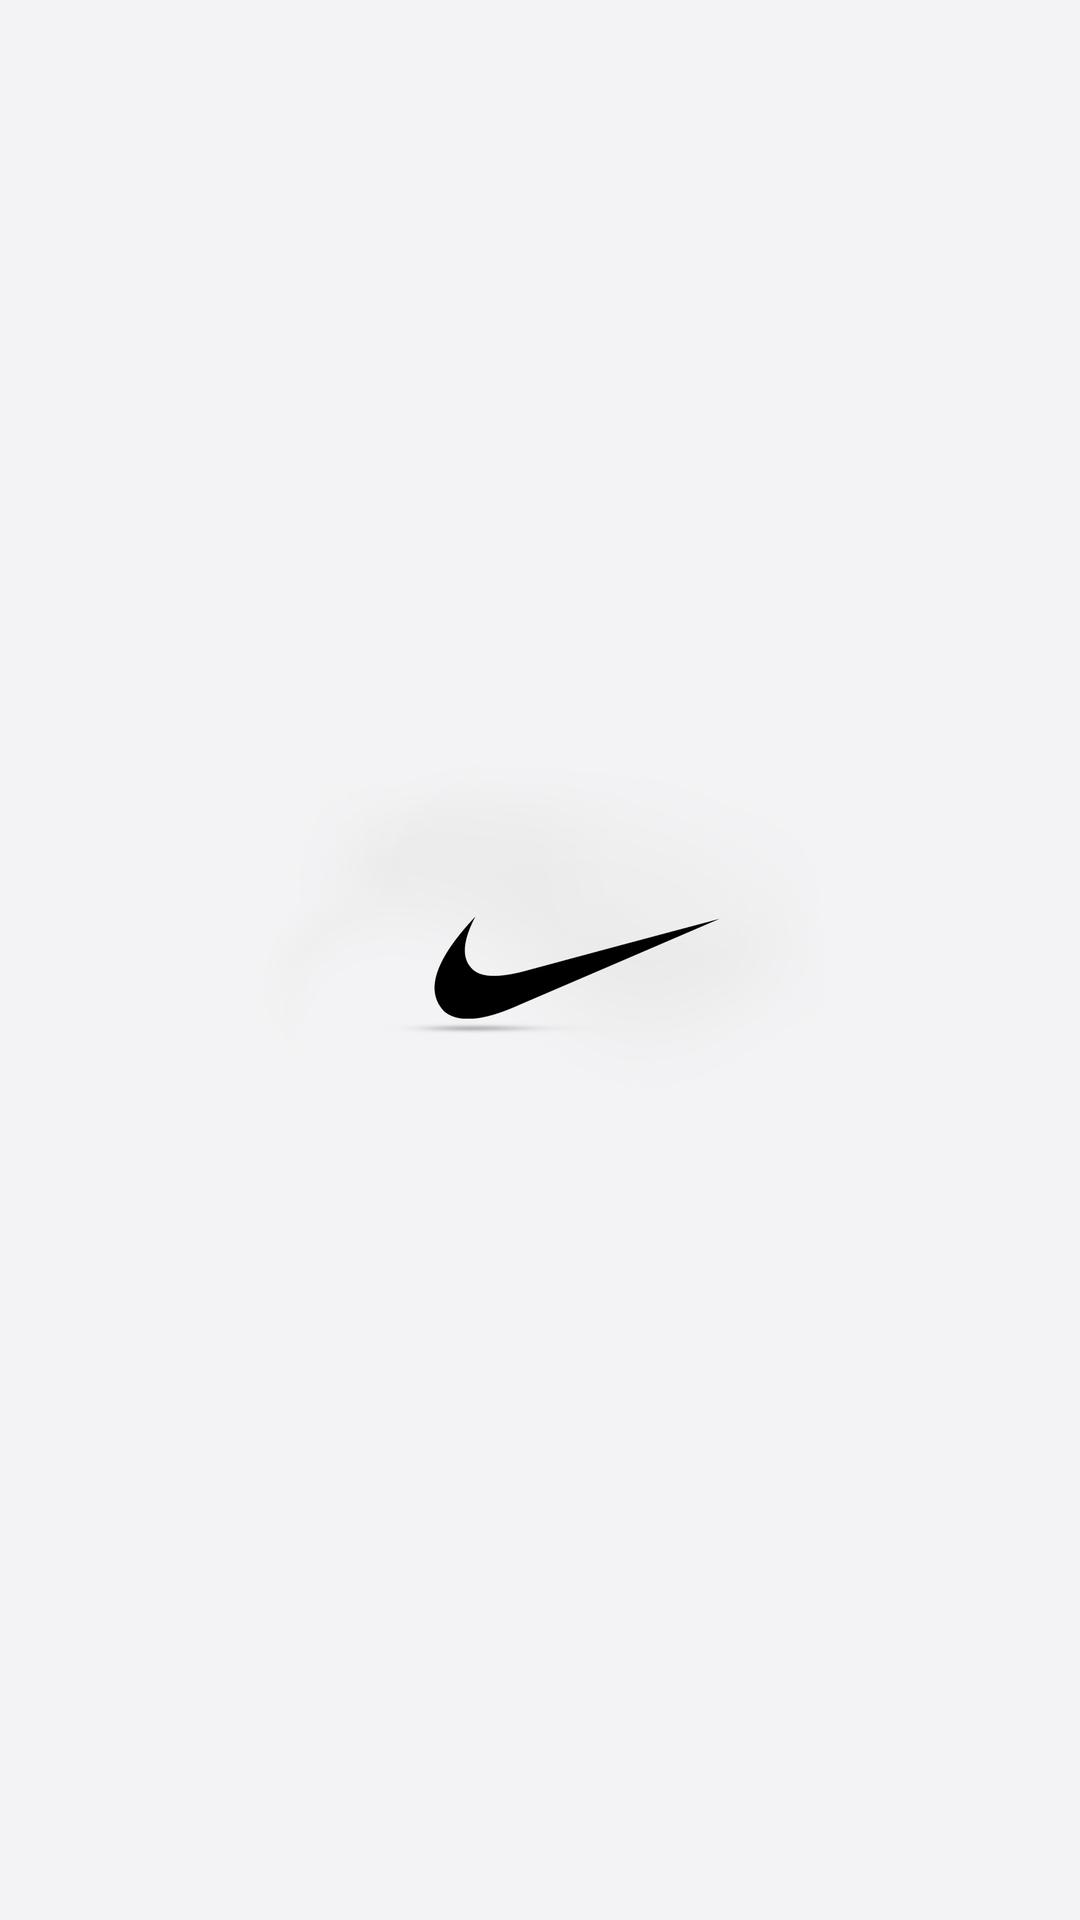 Logo Wallpaper Nike photos of Nike iPhone Wallpaper Here we have 1080x1920